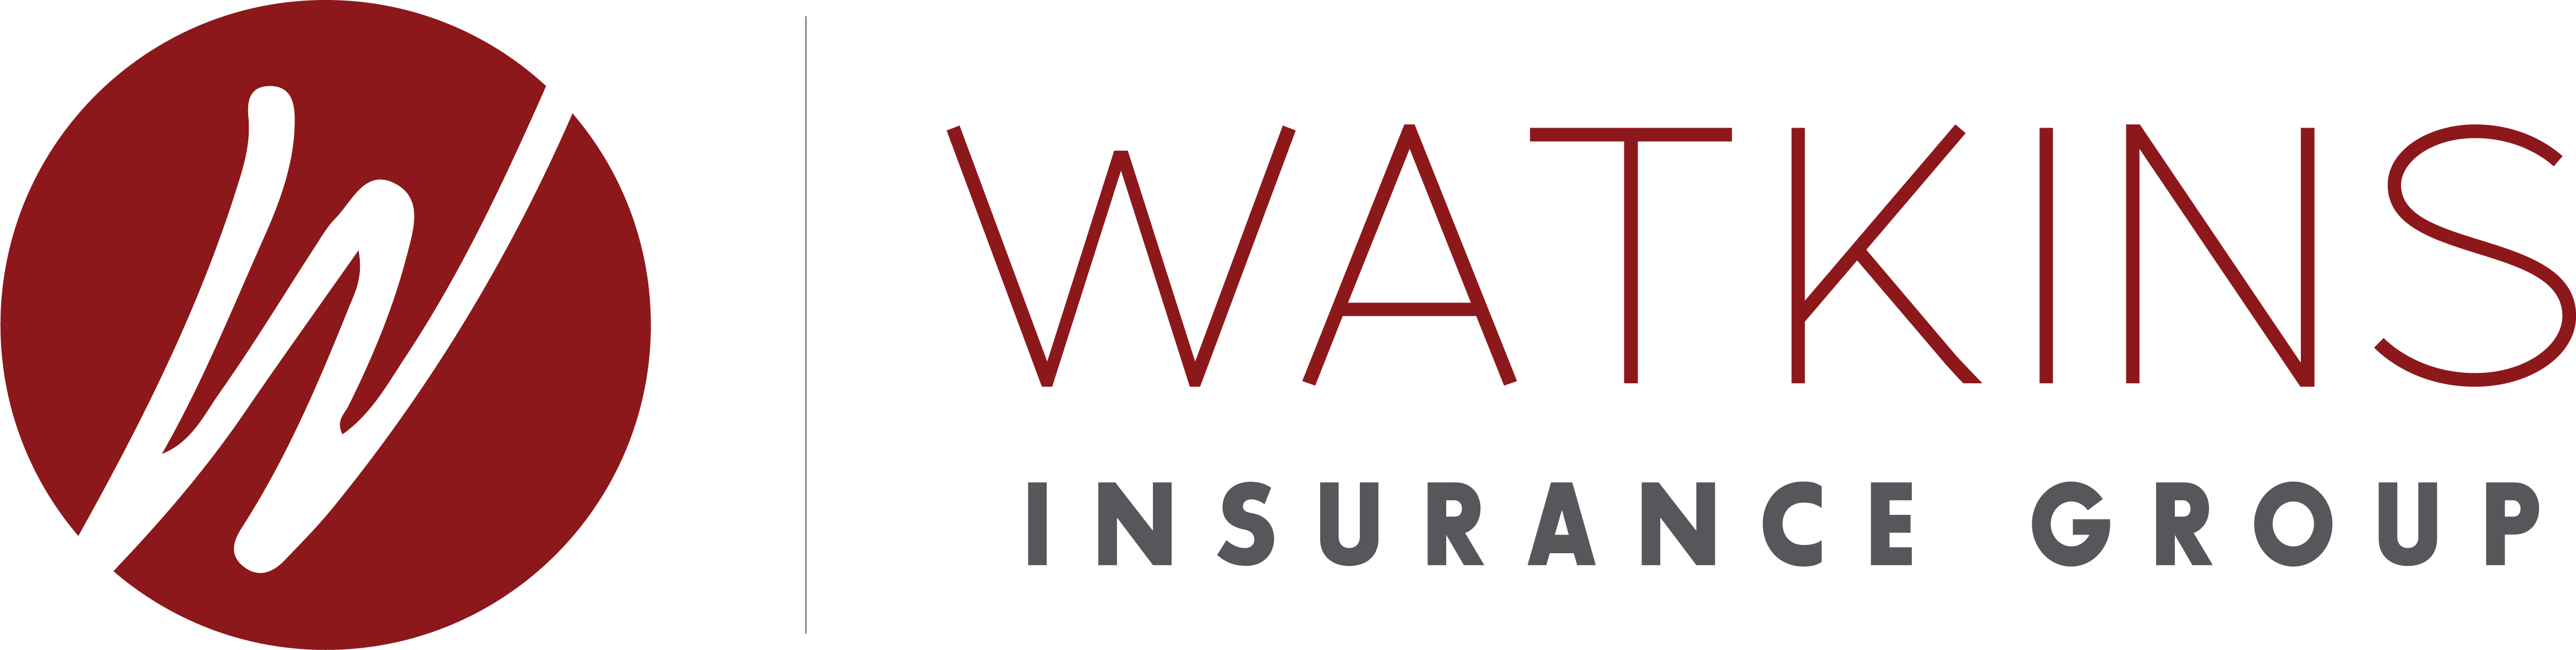 Watkins Insurance Group logo